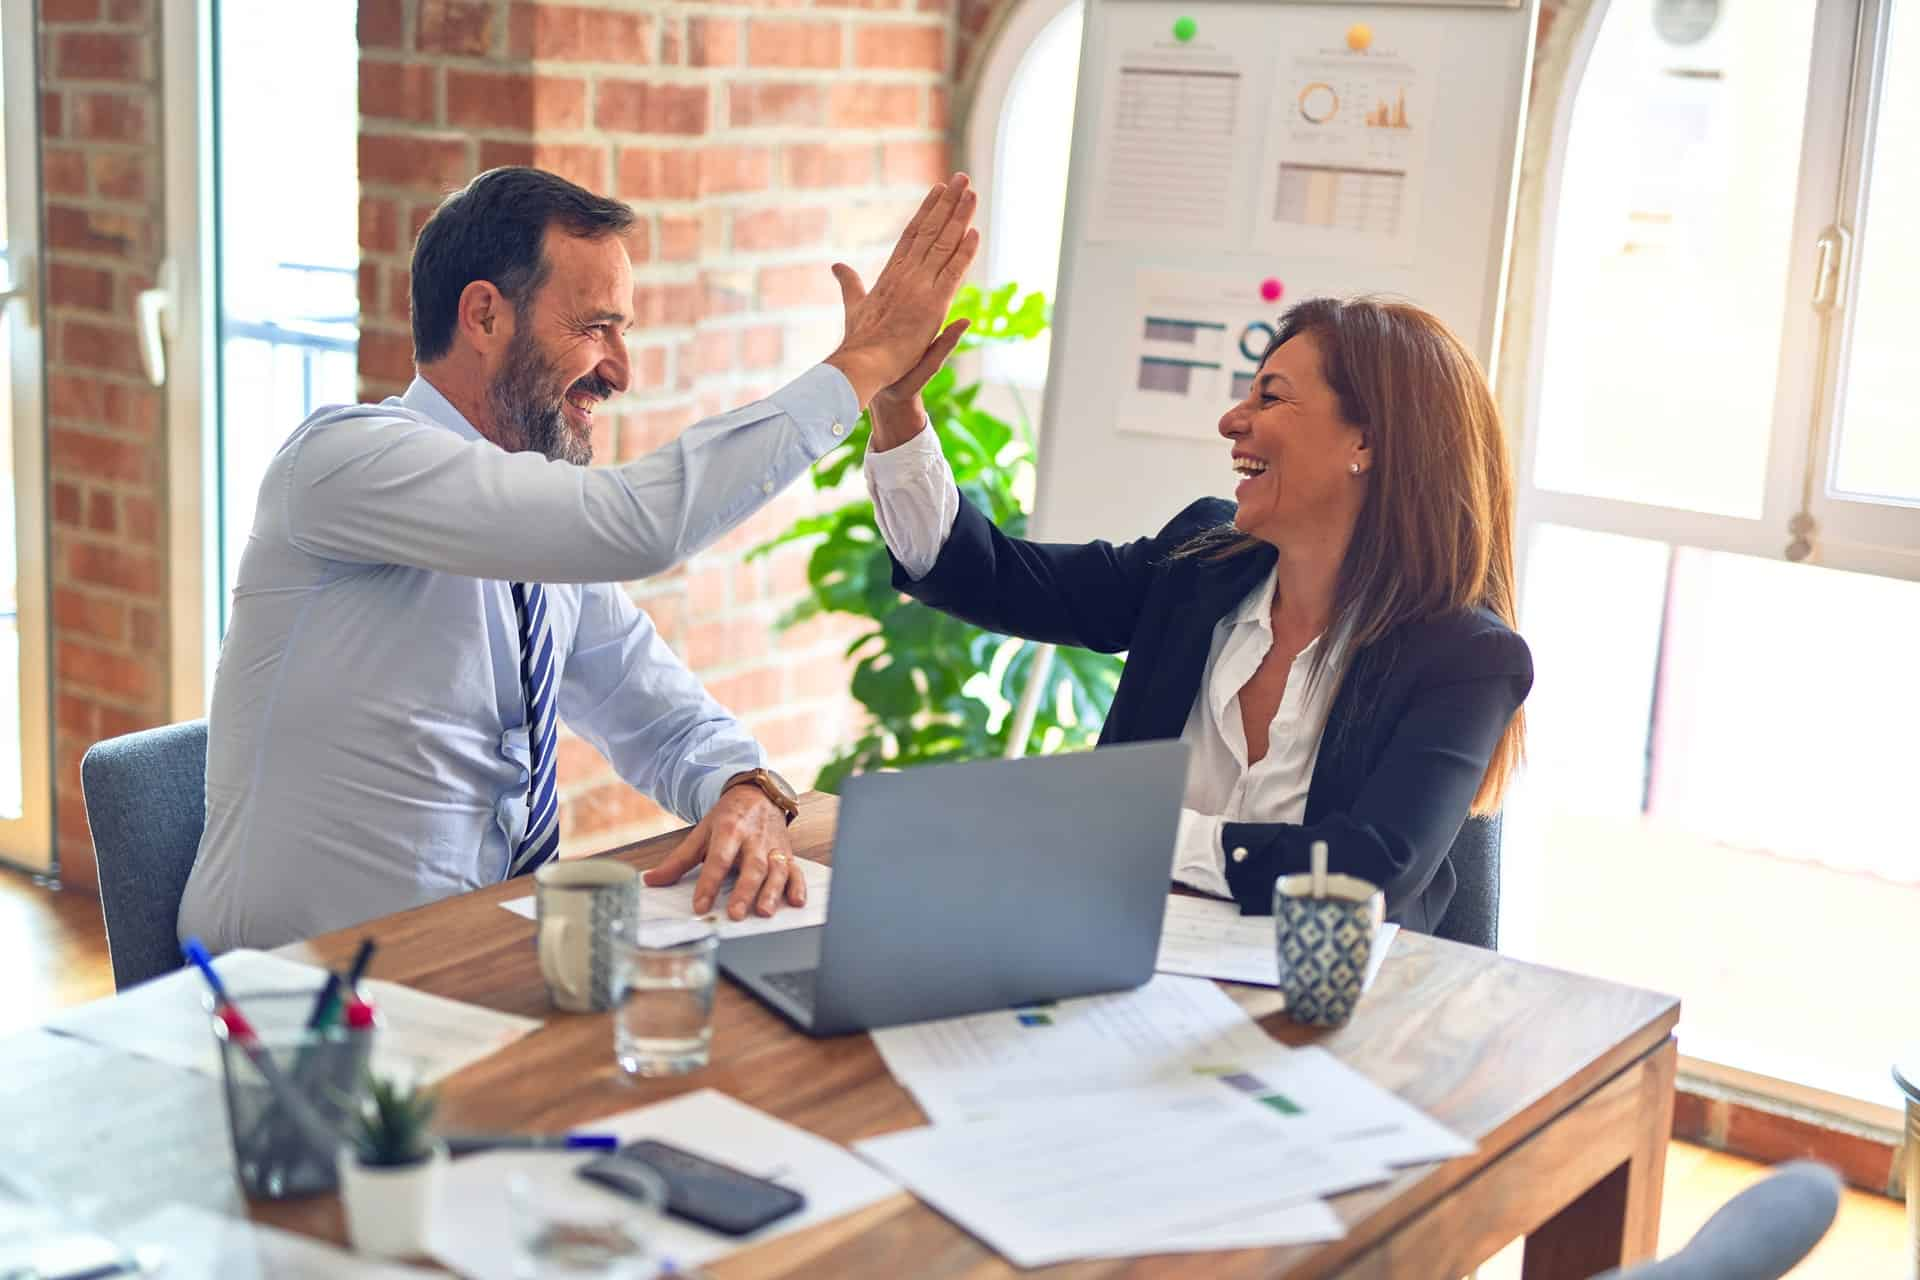 Employee Engagement Programs that Work: 5 Keys